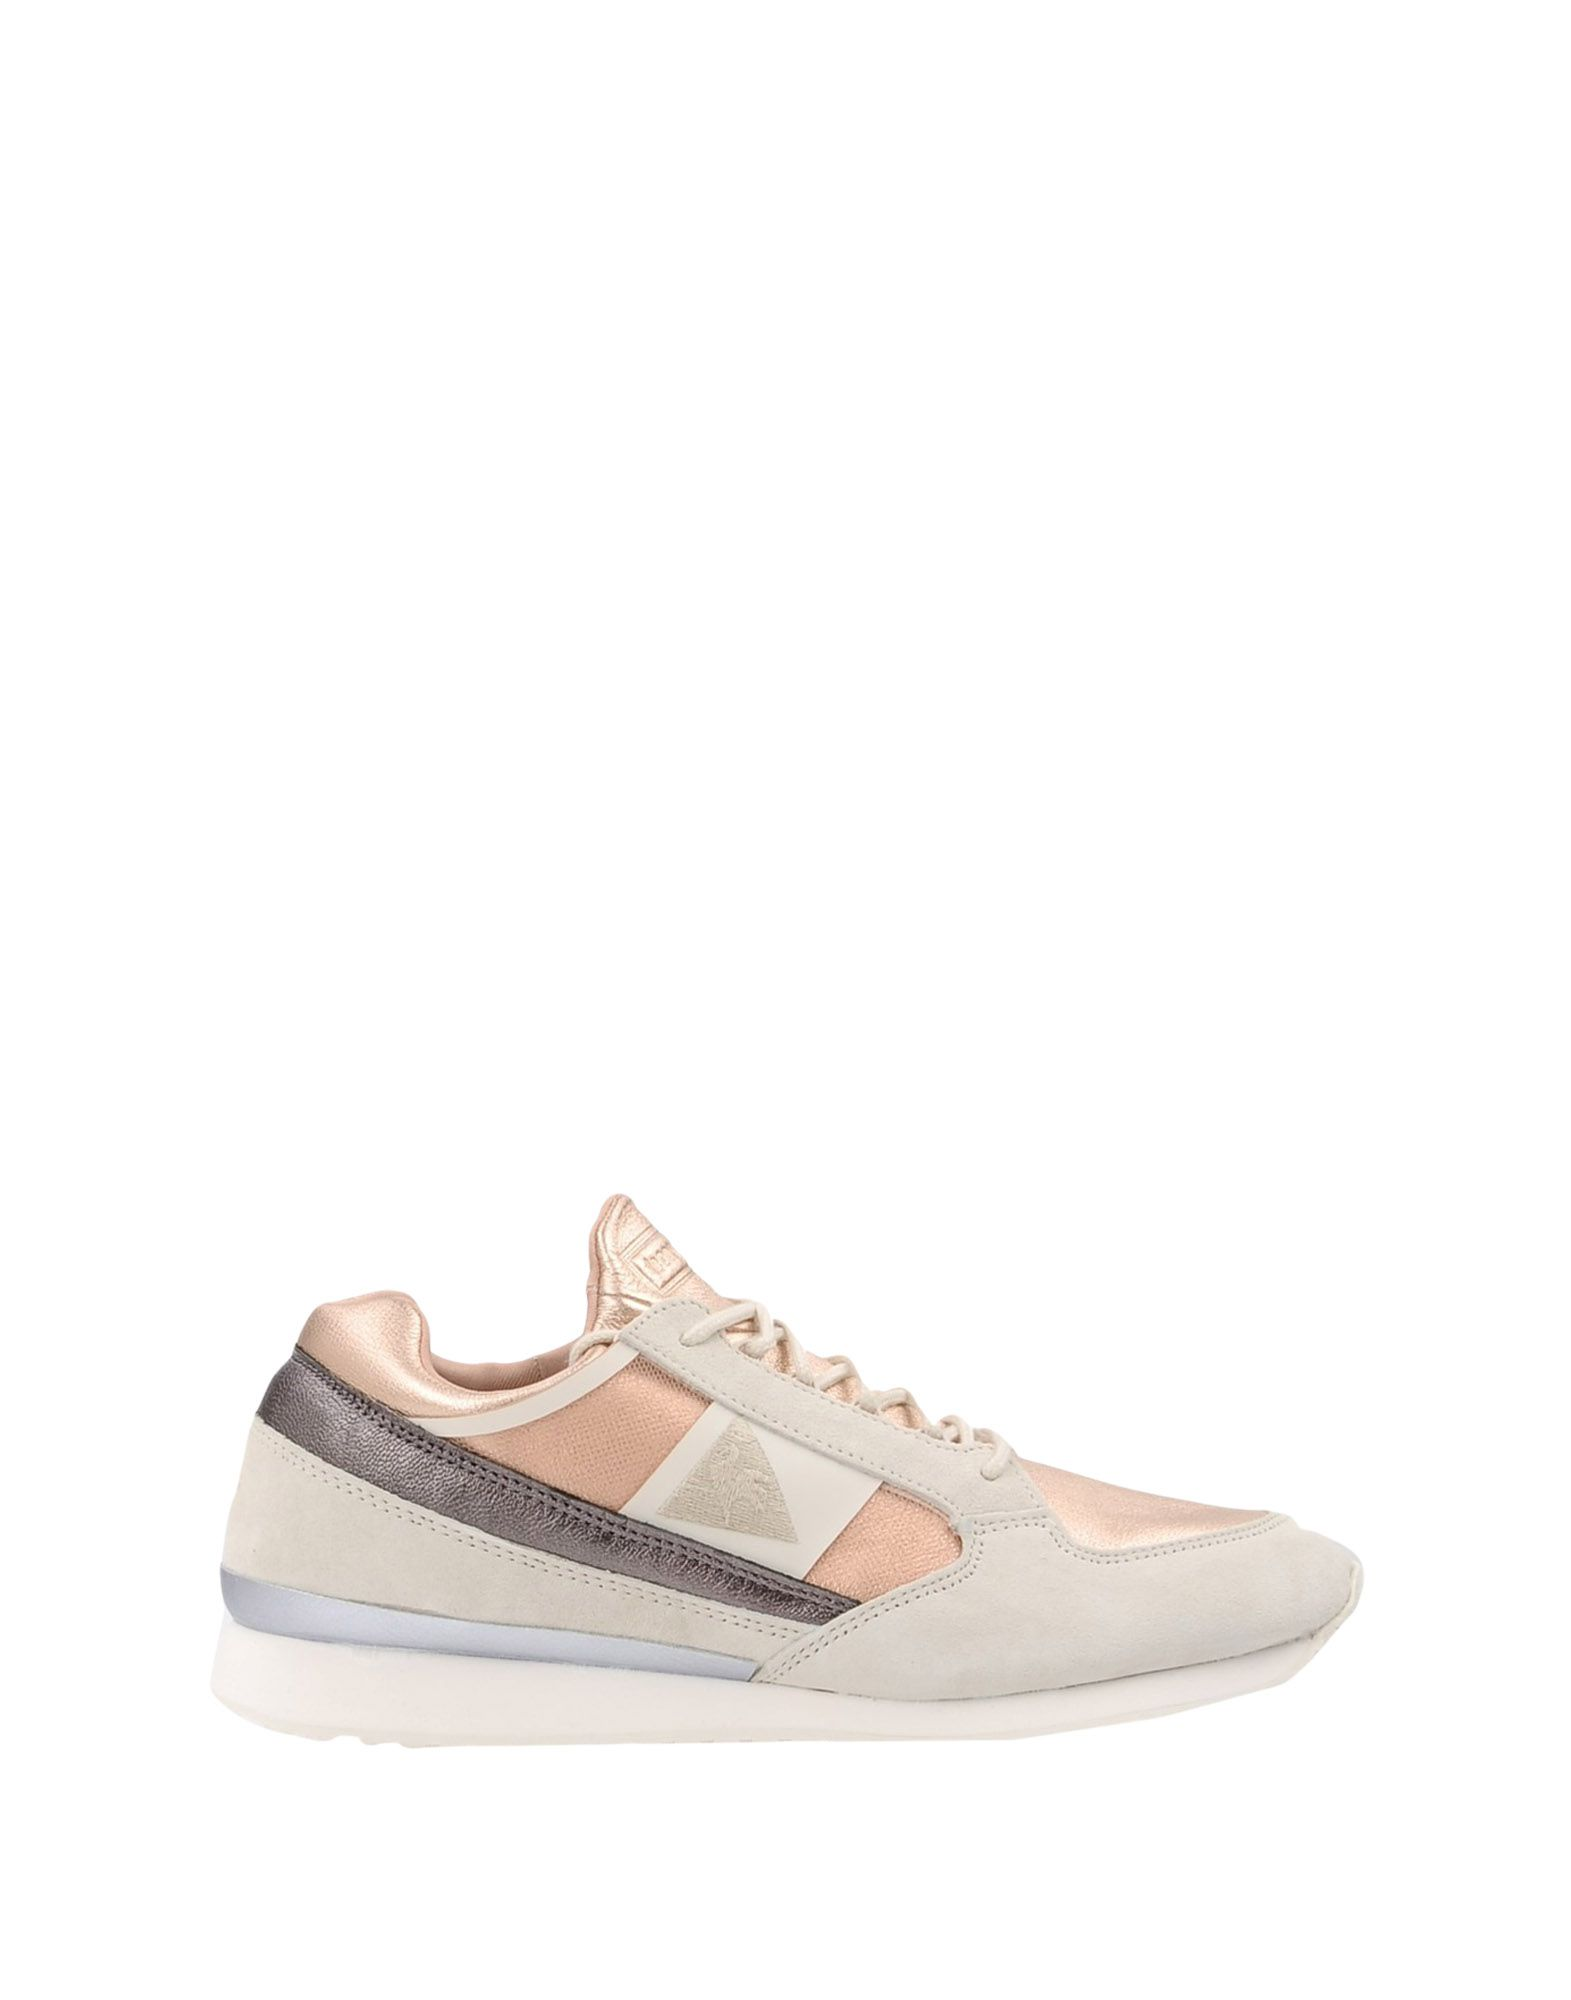 Gut um billige Schuhe Schuhe Schuhe zu tragenLe Coq Sportif Eclat Atl Metallic Leather Mix  11395319KH 196130